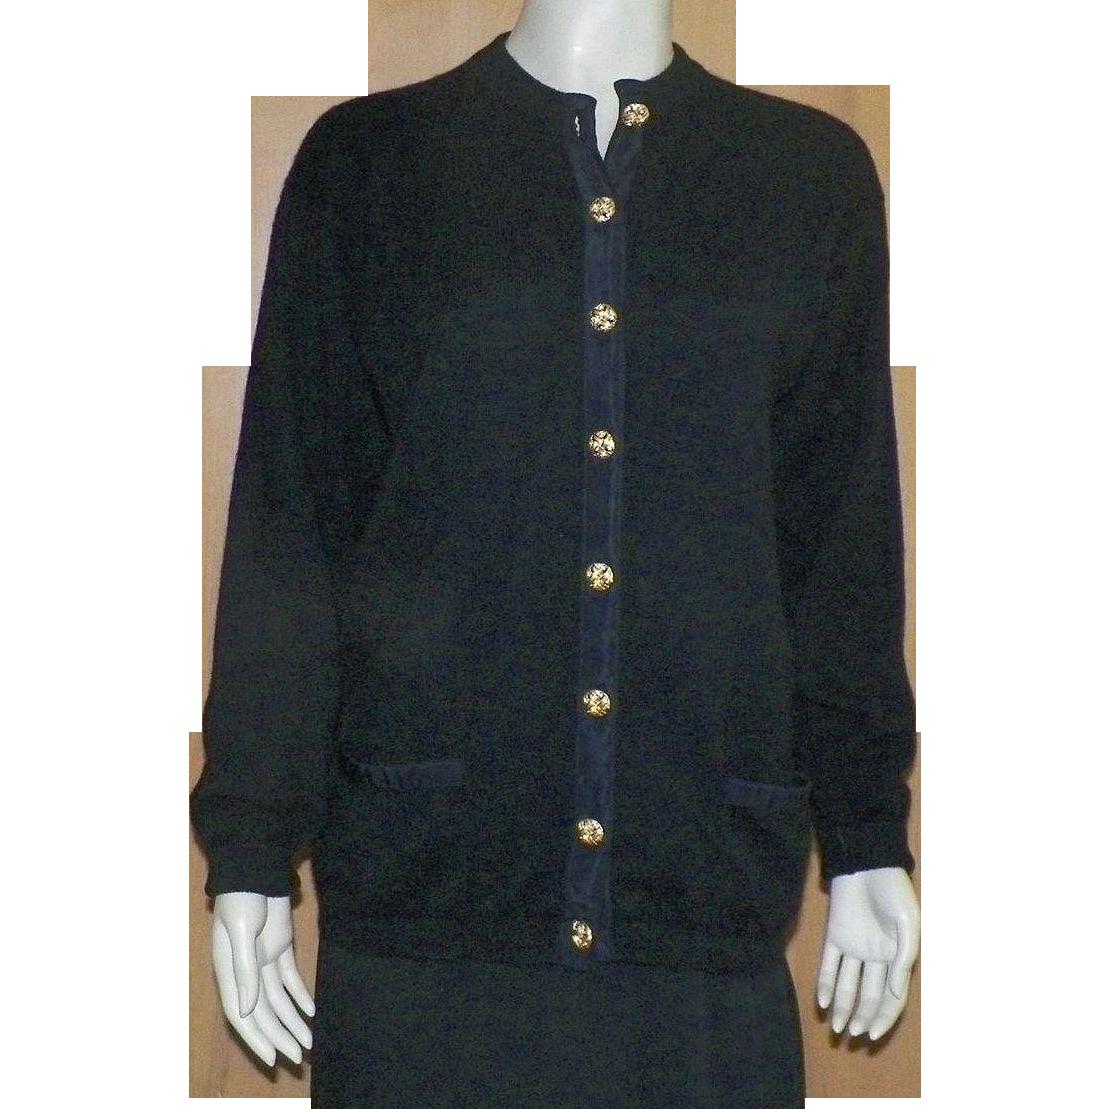 Vintage Burberrys Black Cashmere Cardigan Sweater Scotland 1980's L